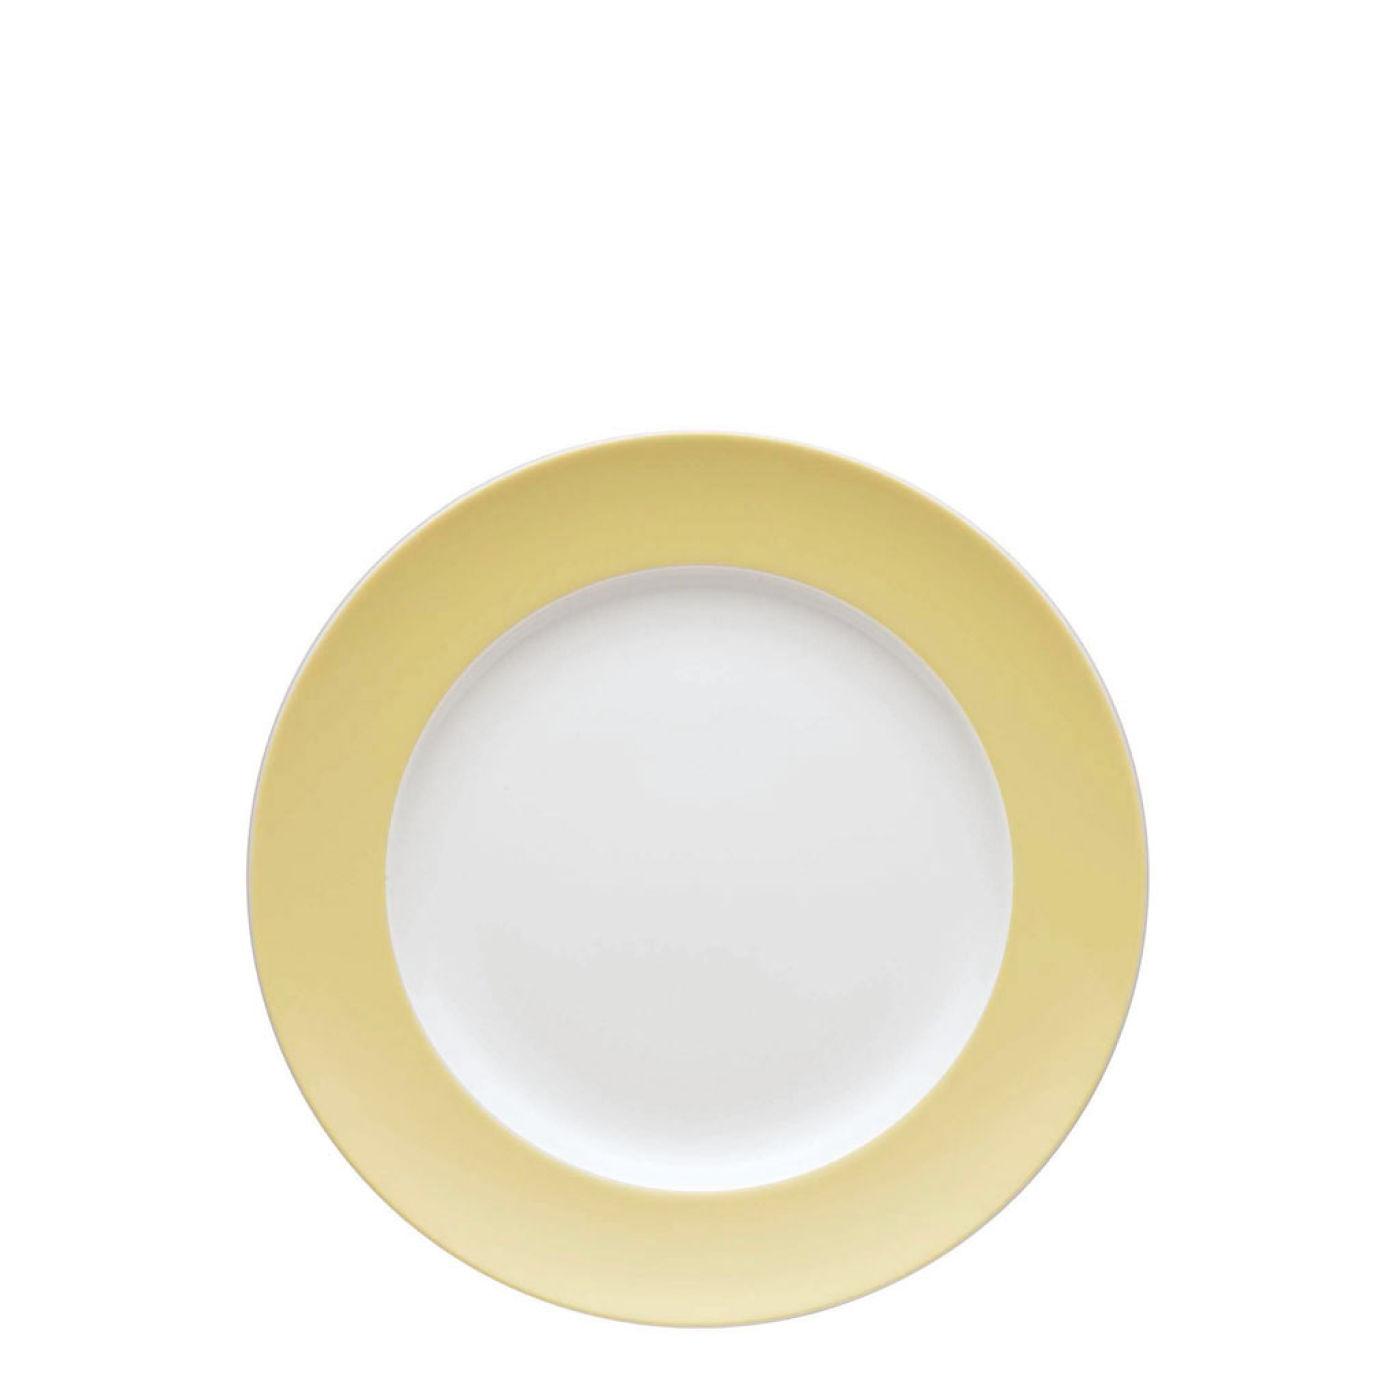 Онлайн каталог PROMENU: Тарелка десертная/закусочная Rosenthal SUNNY DAY, диаметр 22 см, желтый Rosenthal 70850-408511-10222